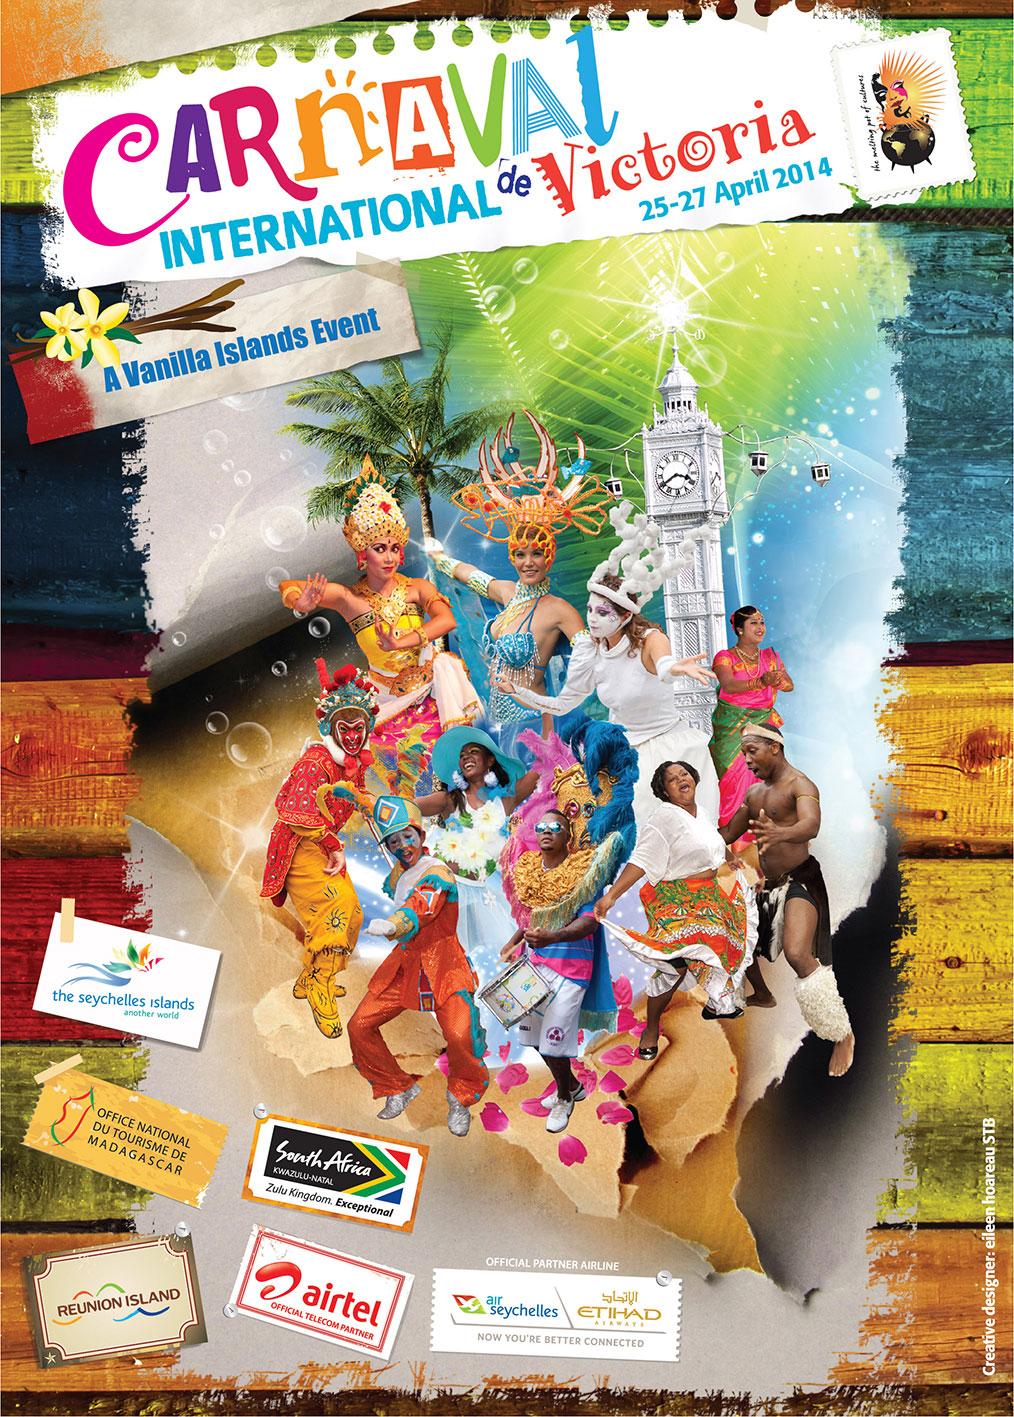 Seychelles Carnaval 2014 Superyacht Agent Yacht Agency